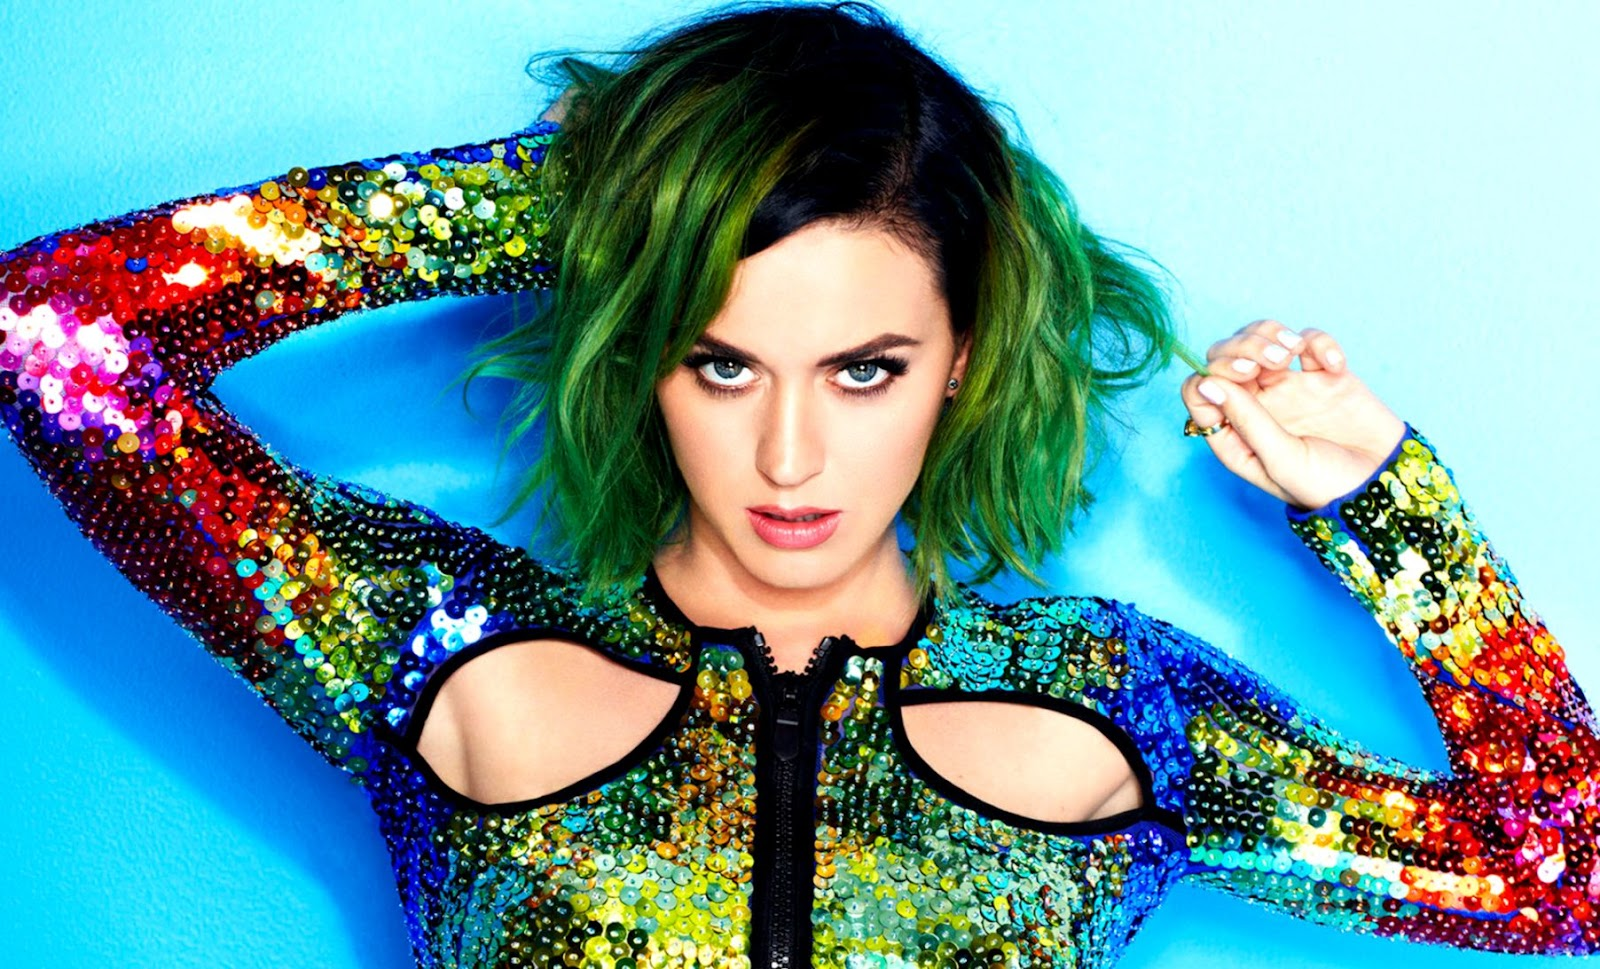 Katy Perry Hd Wallpaper Wallpapers Box